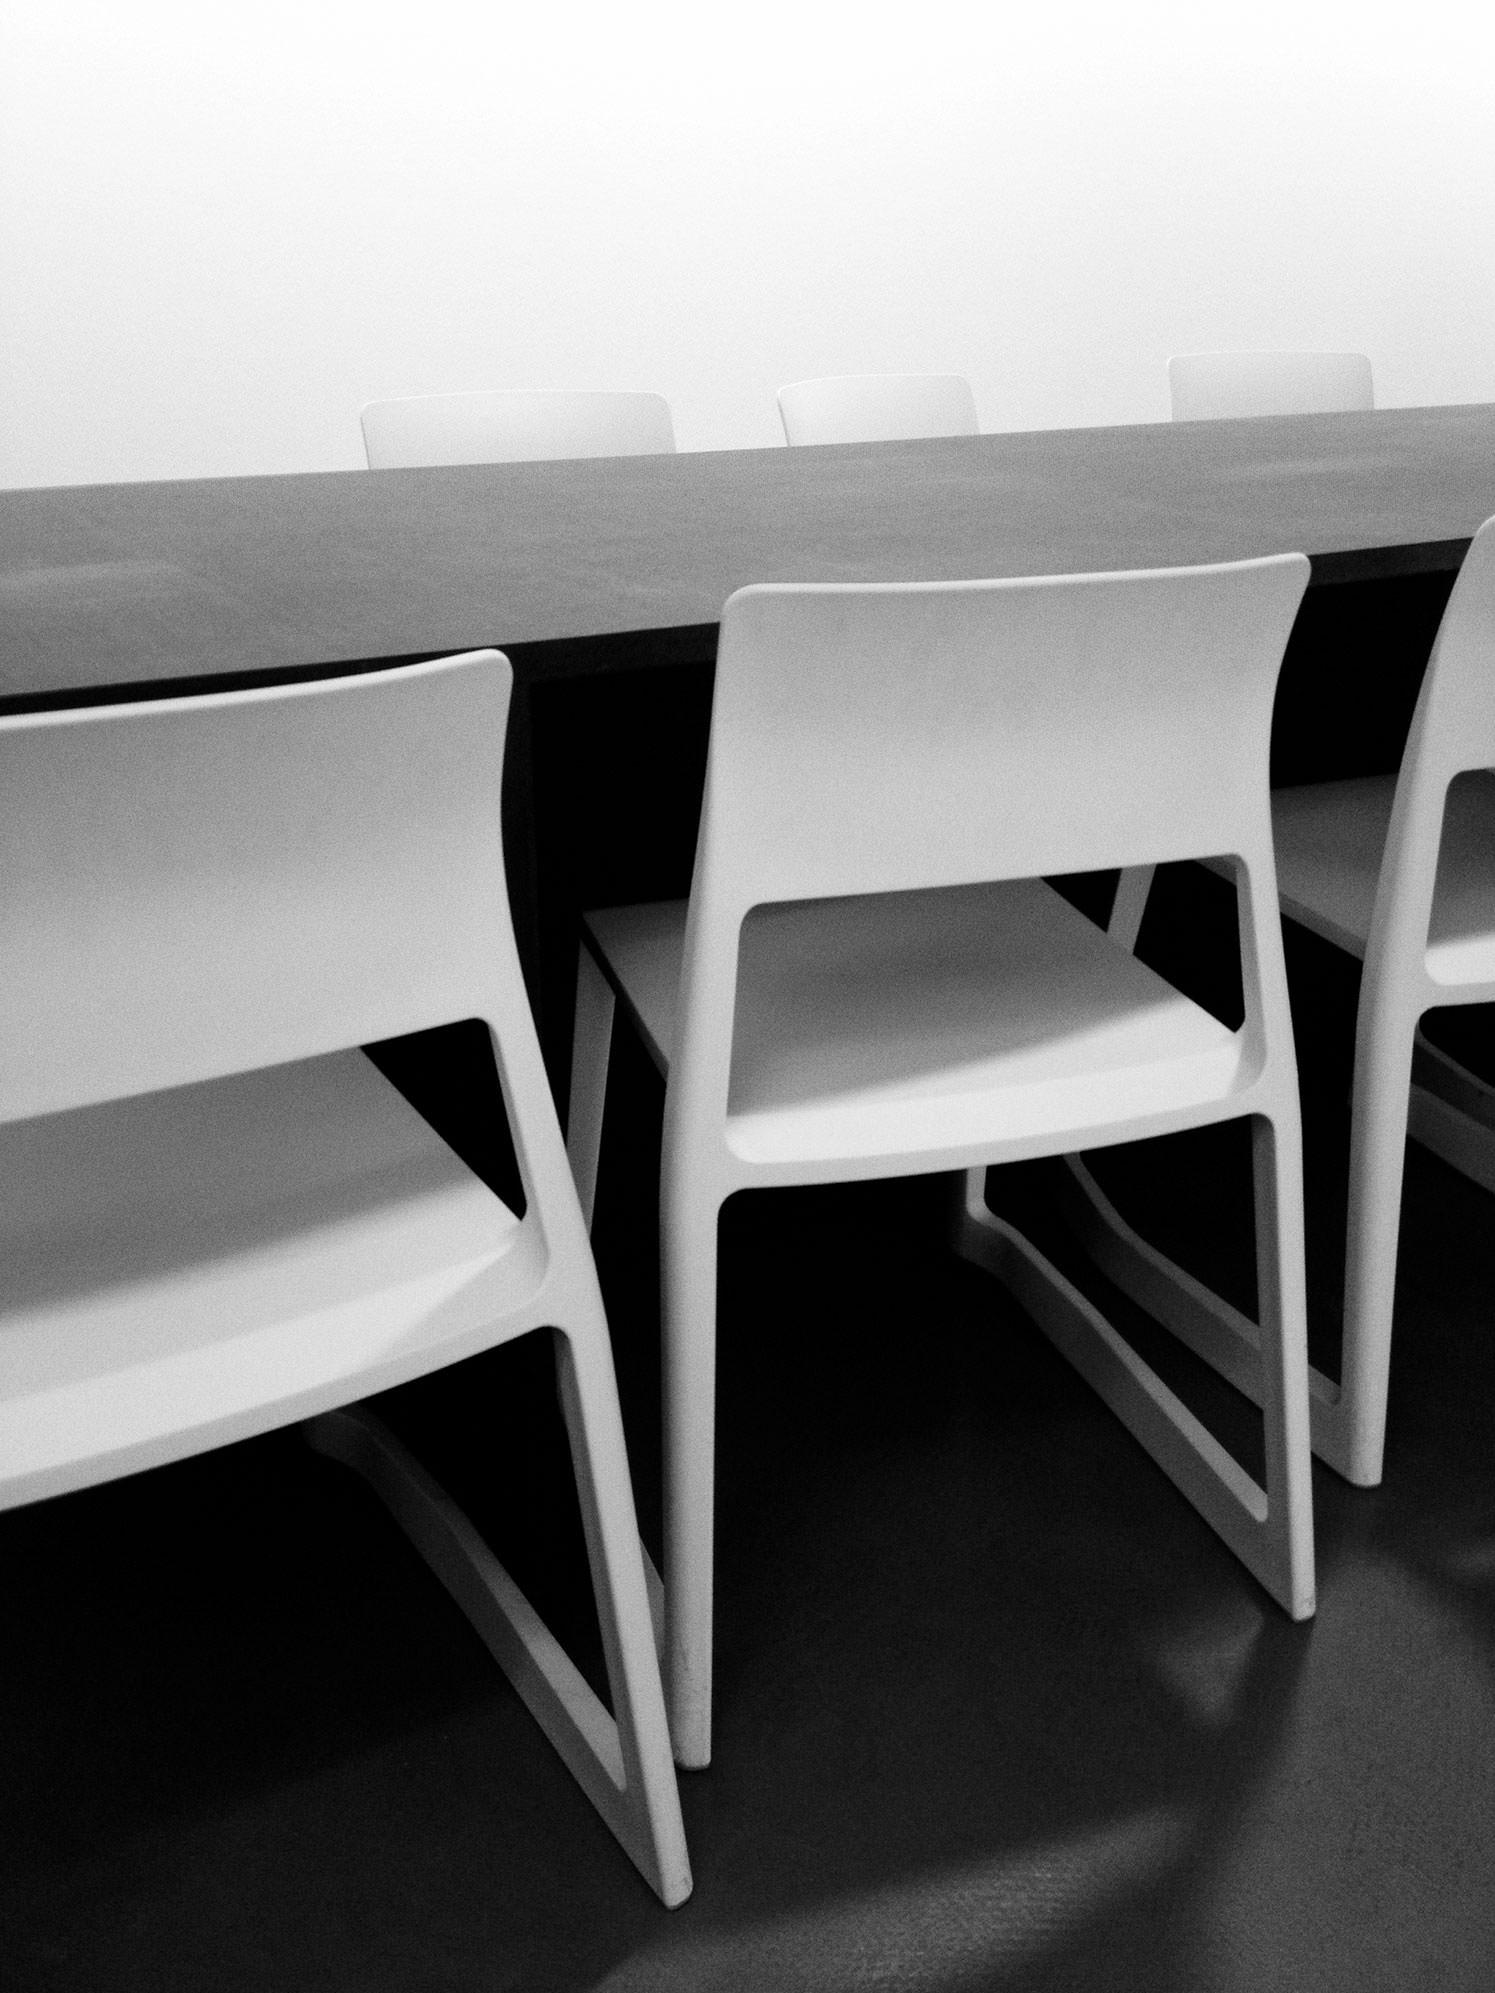 B/W Image, Kunstverein FN – Tip Ton Chair